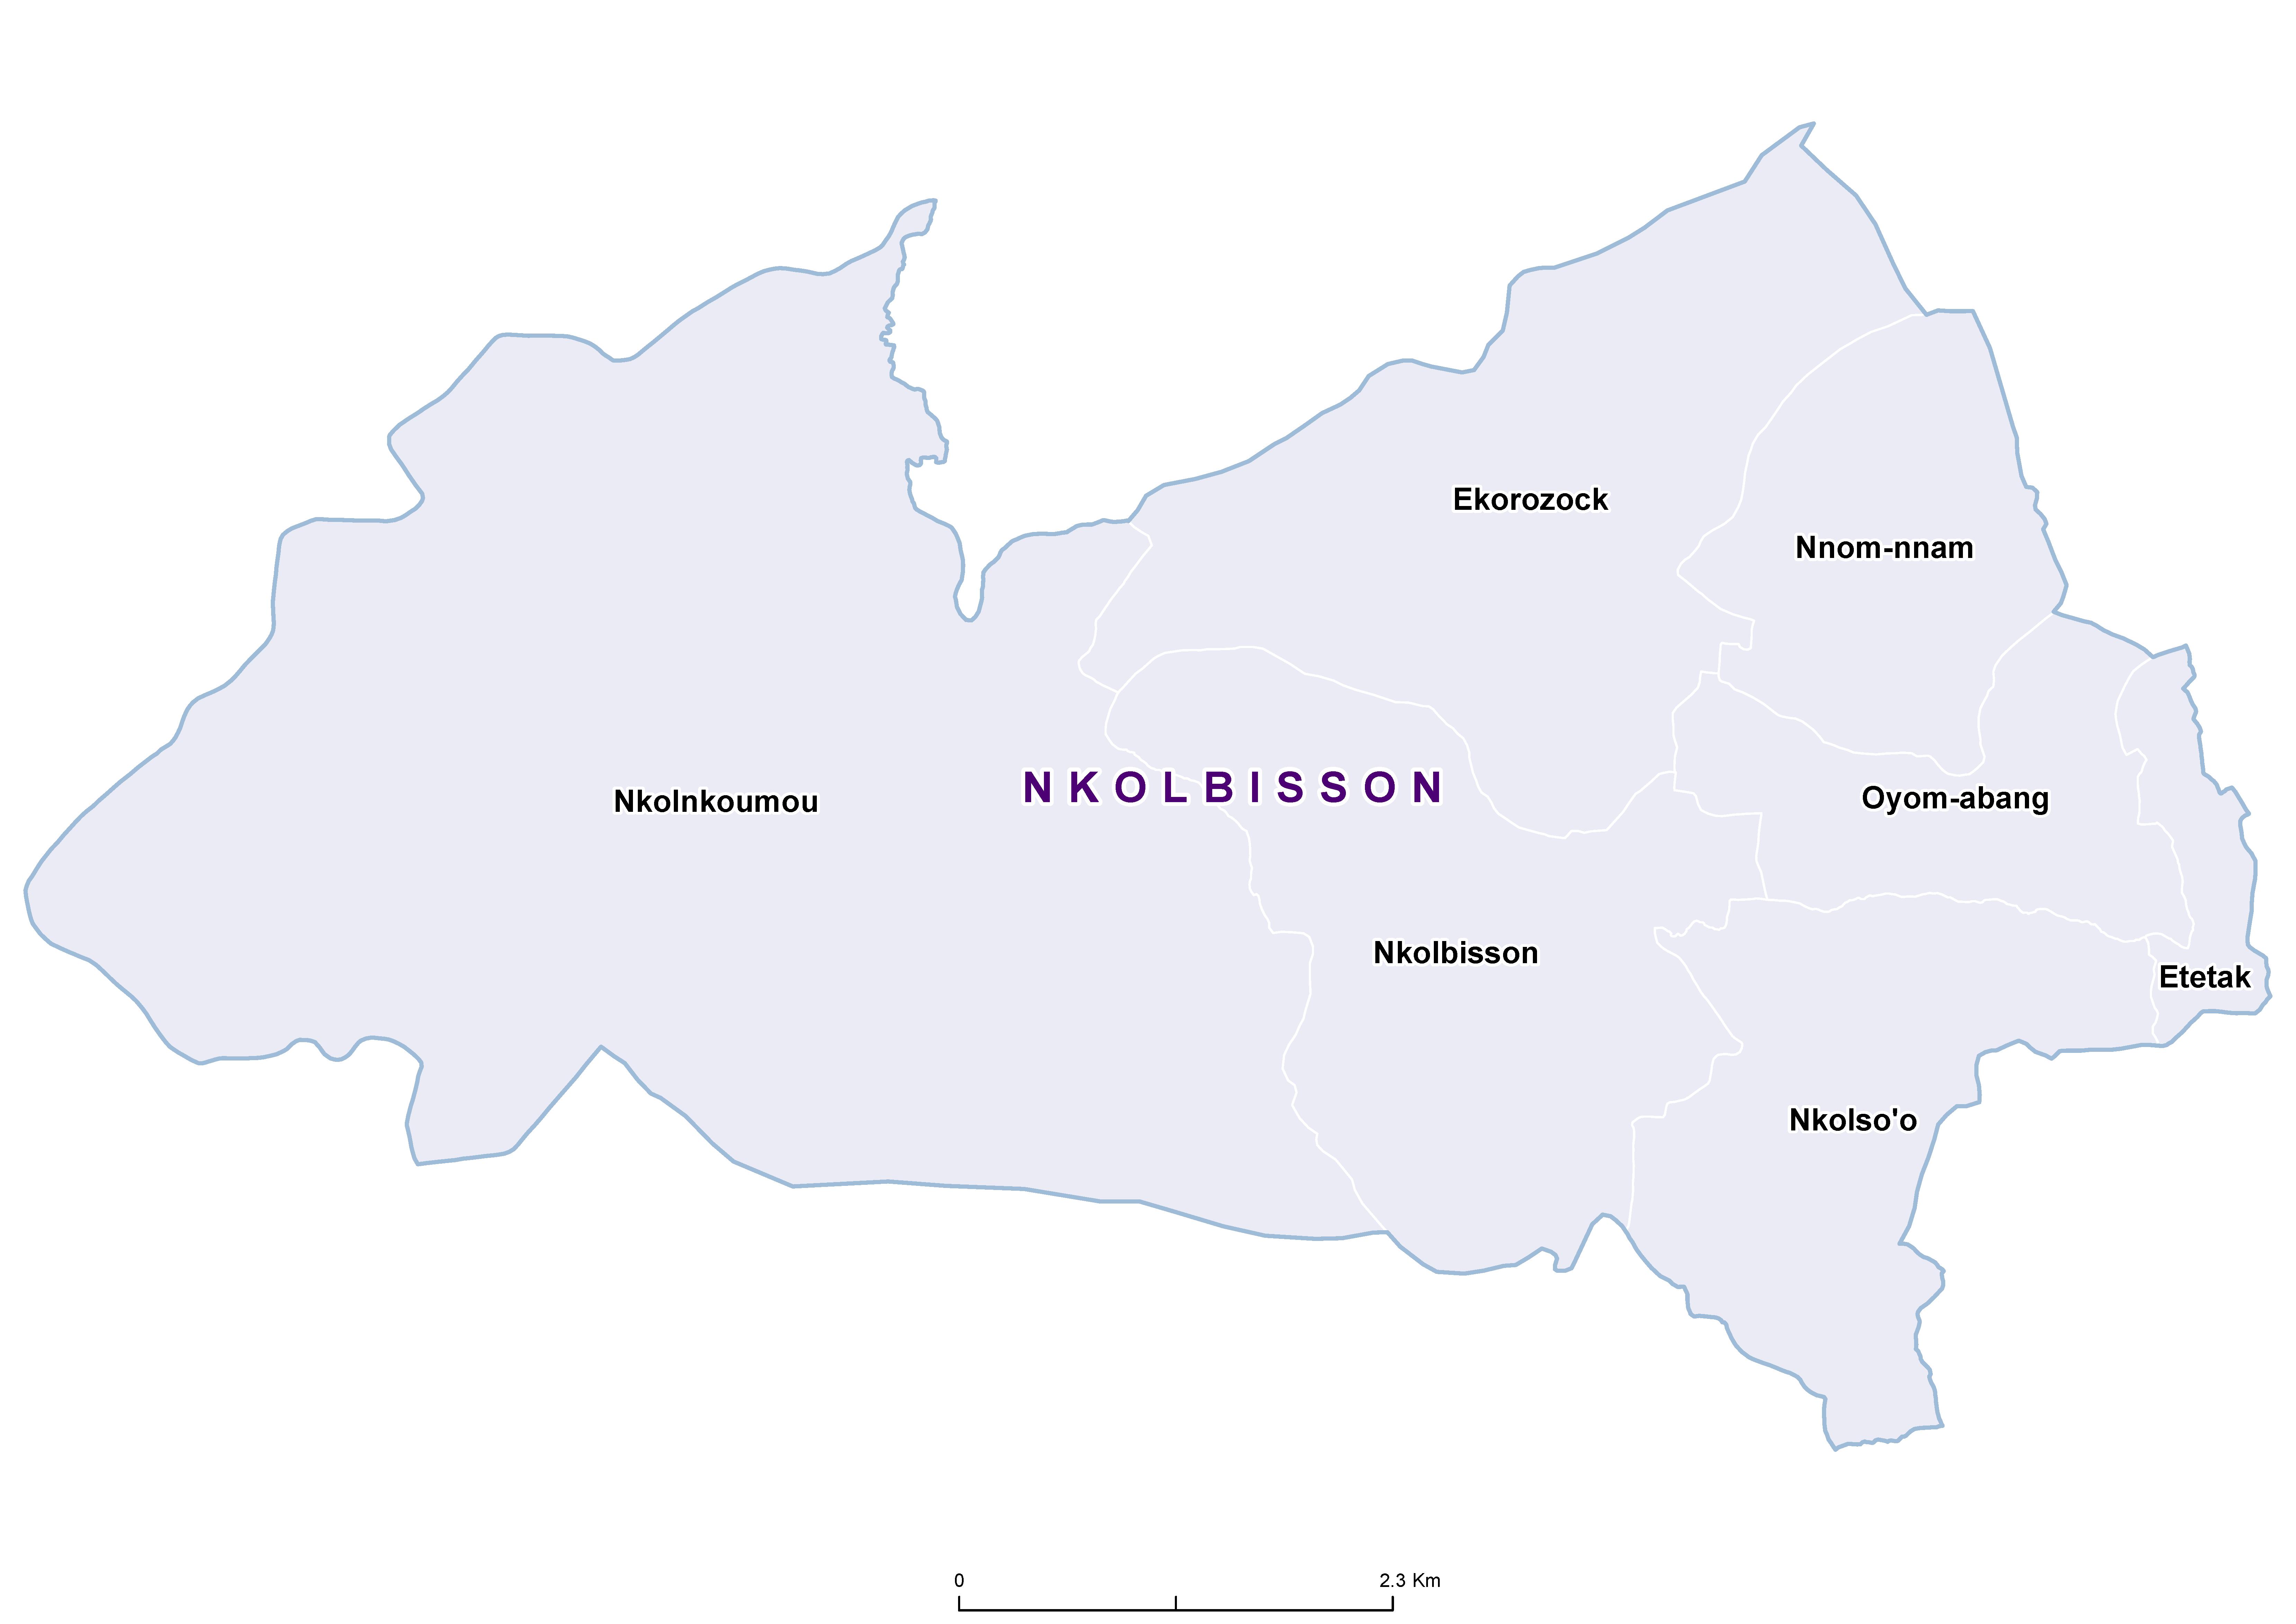 Nkolbisson STH 19850001